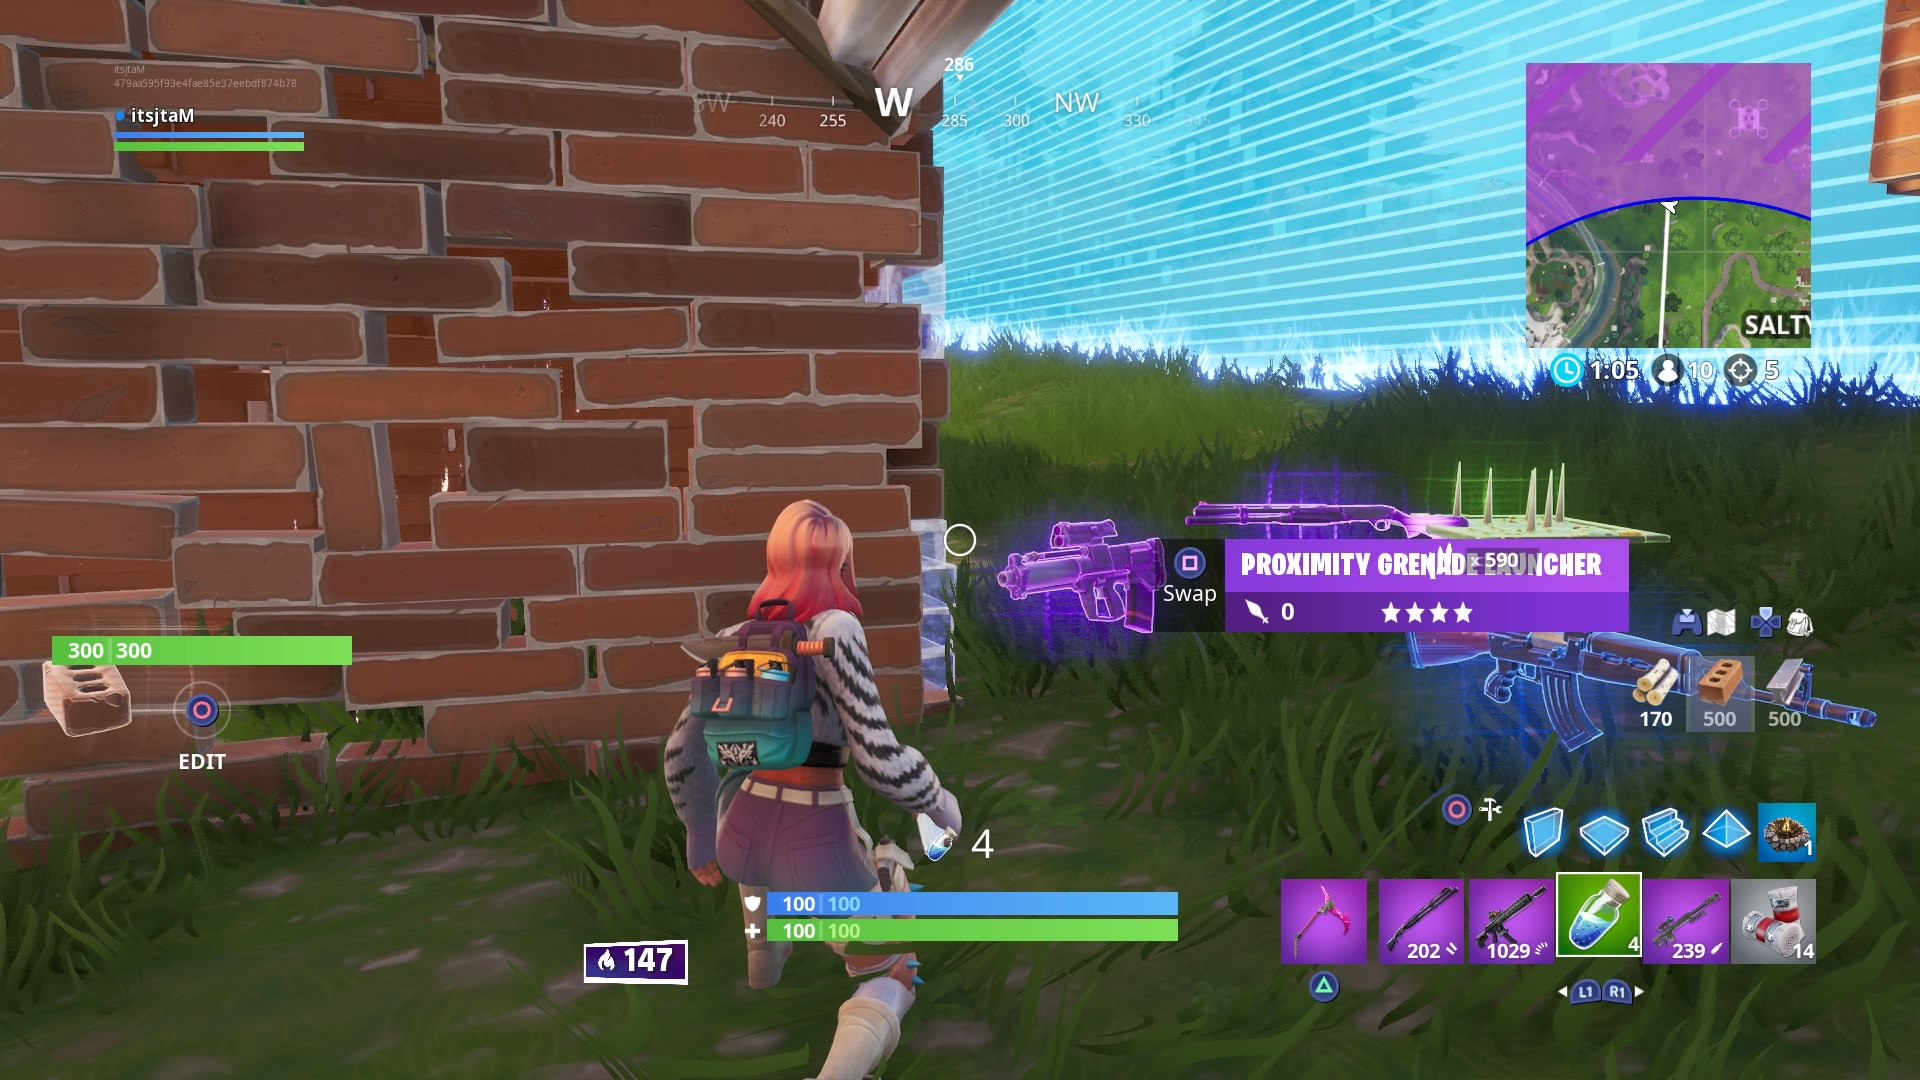 fortnite proximity grenade launcher wallpaper 67847